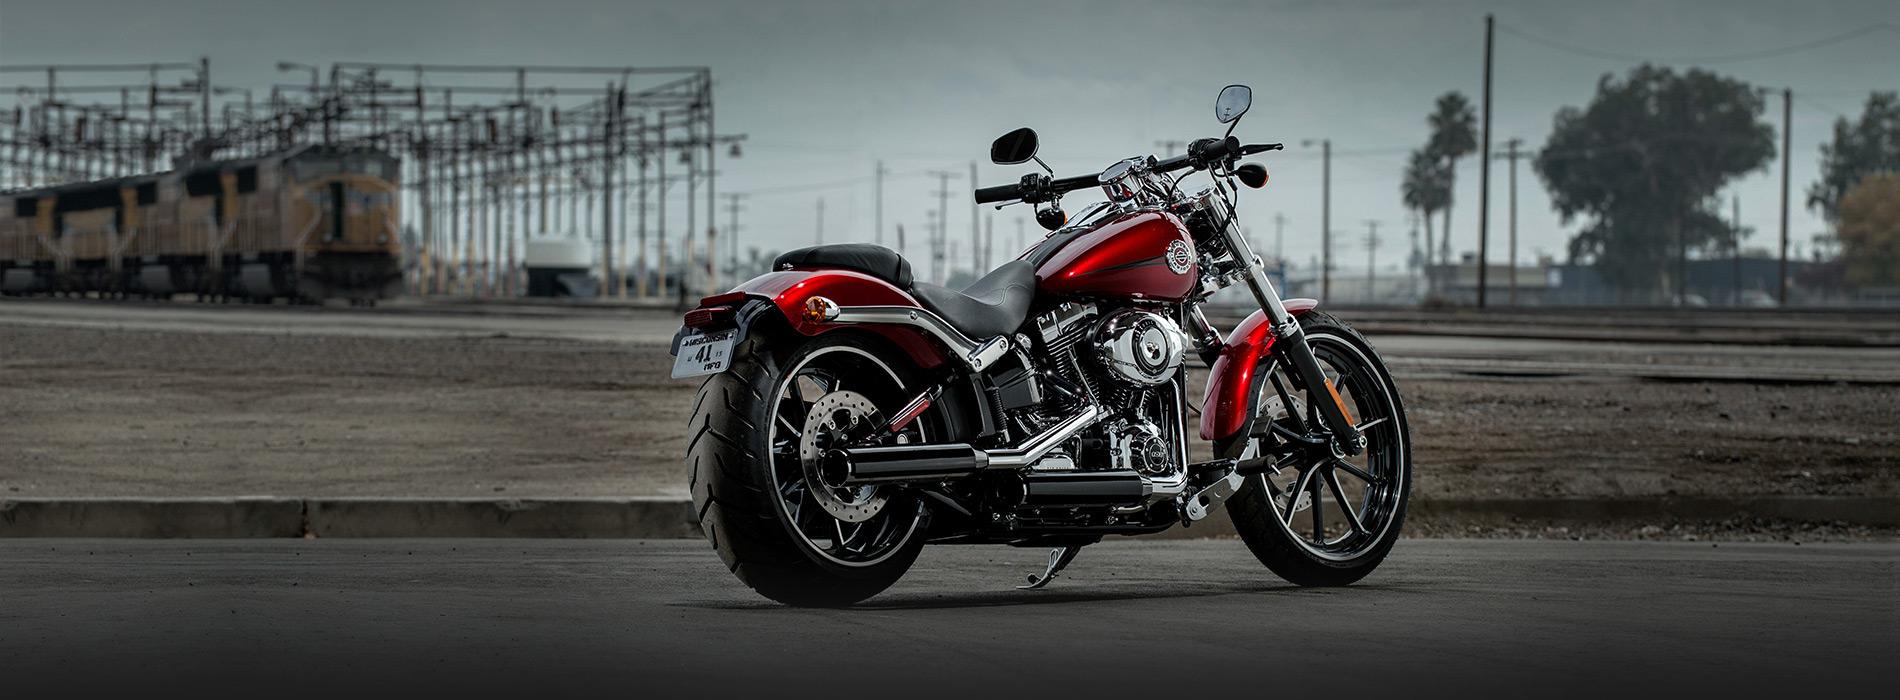 13 Hd Breakout 6 Harley Davidson